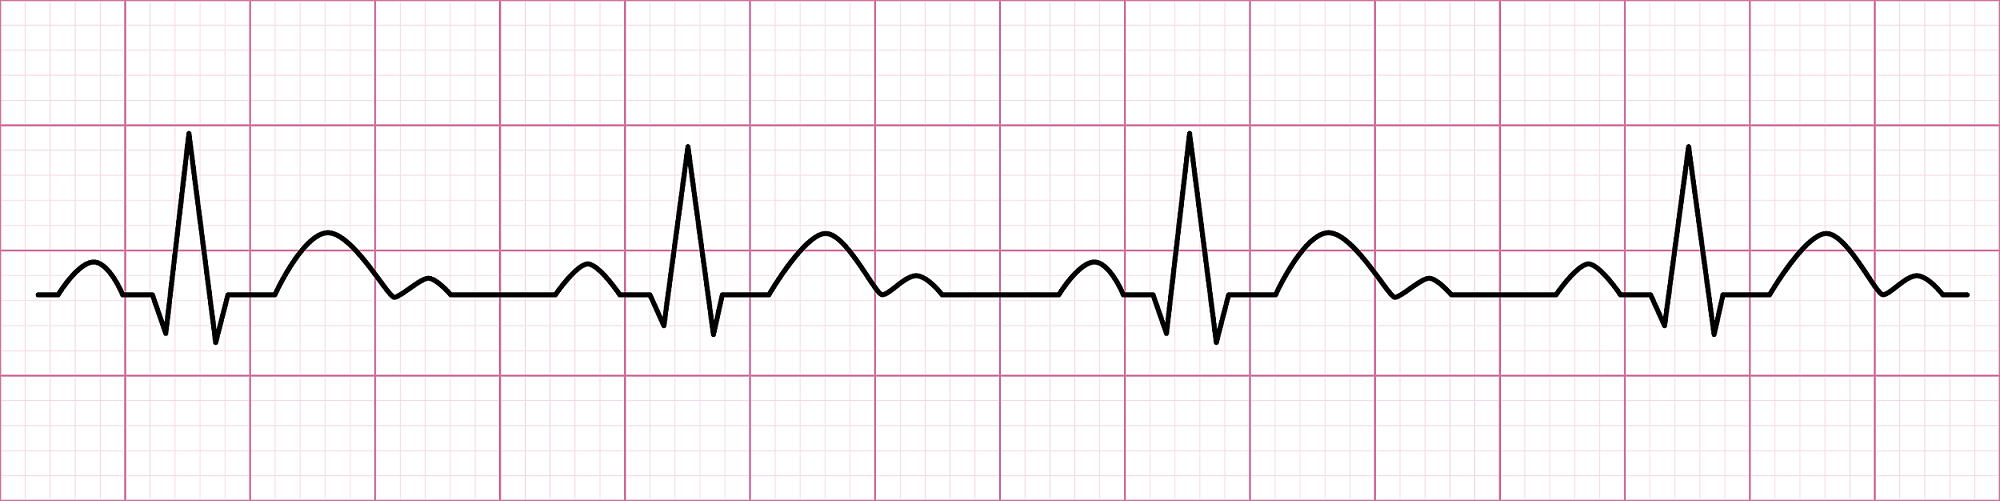 courbe cardiaque - cohérence cardiaque | Performance et coaching